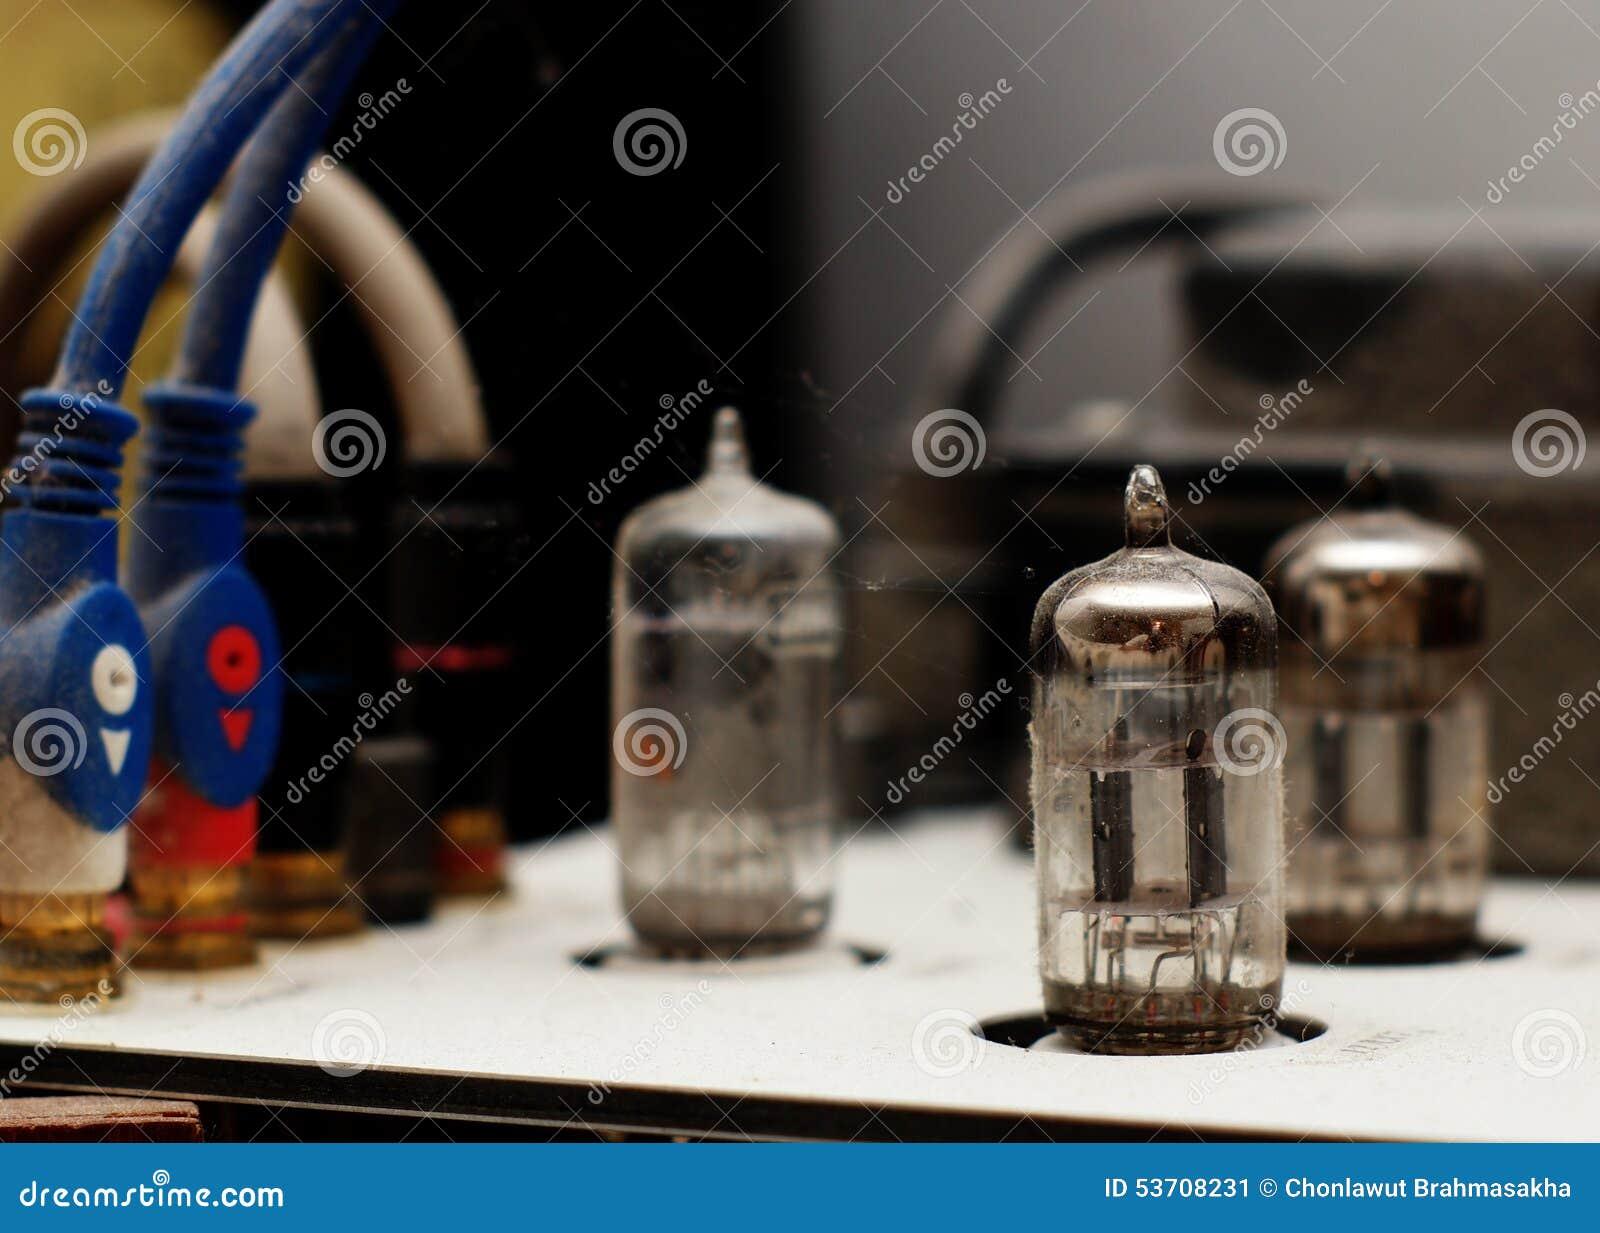 Tube amp stock image  Image of electronics, component - 53708231